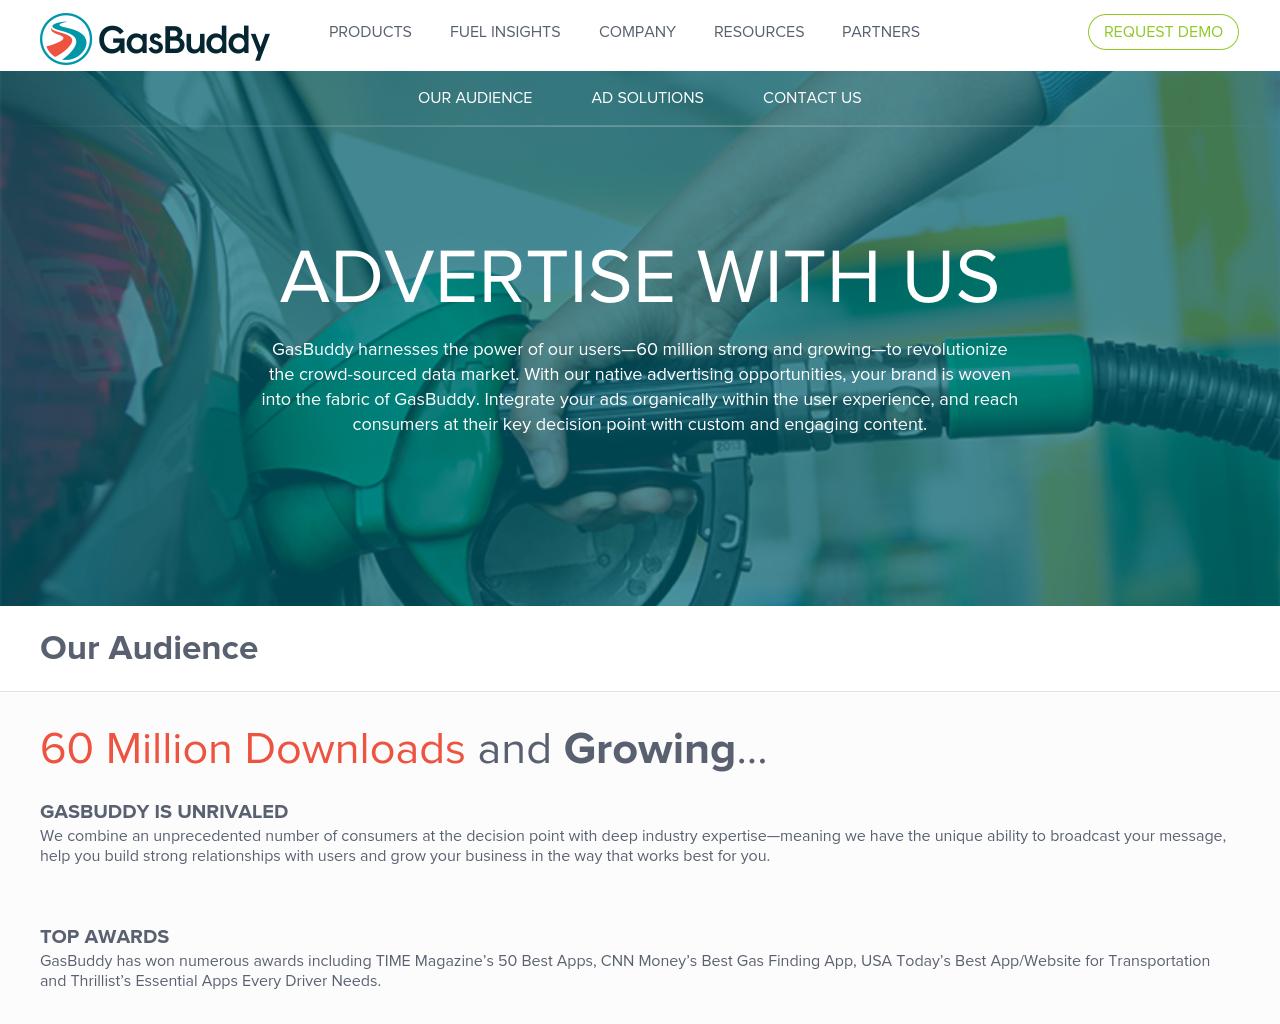 Grand-Rapids-GasBuddy-Advertising-Reviews-Pricing